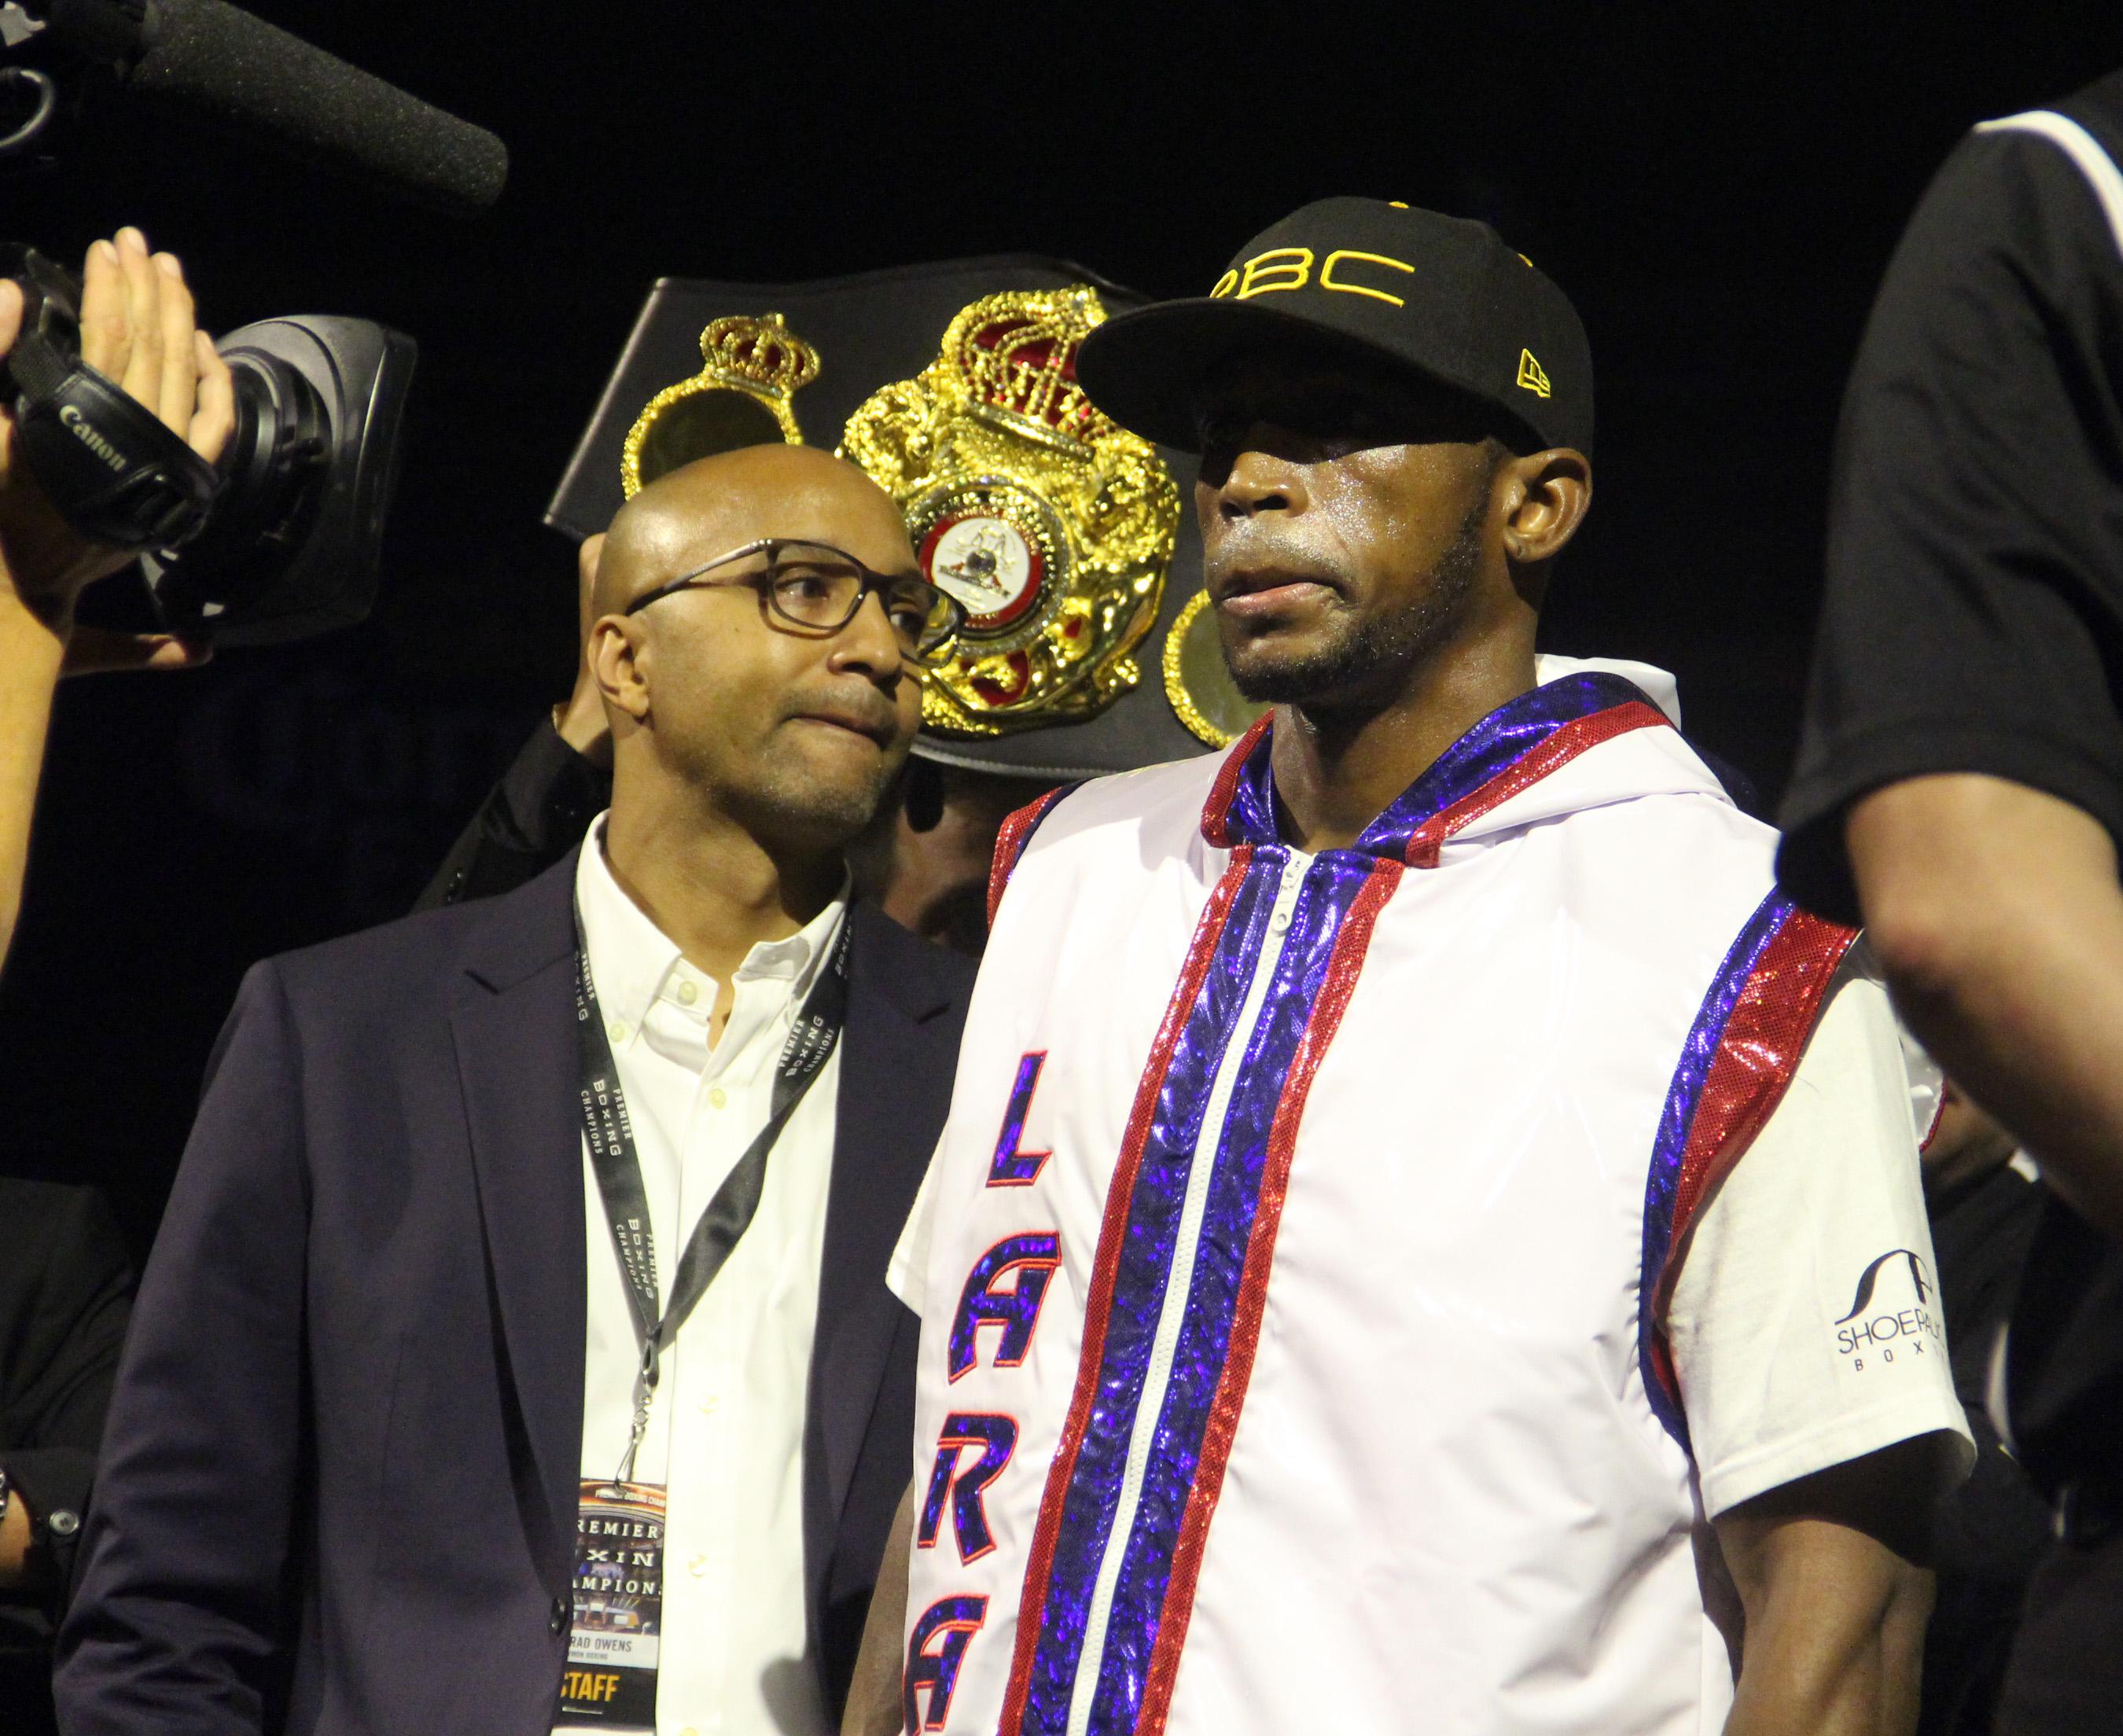 Erislandy Lara and Ramon Alvarez will fight for the WBA World 154 lbs Title this Saturday